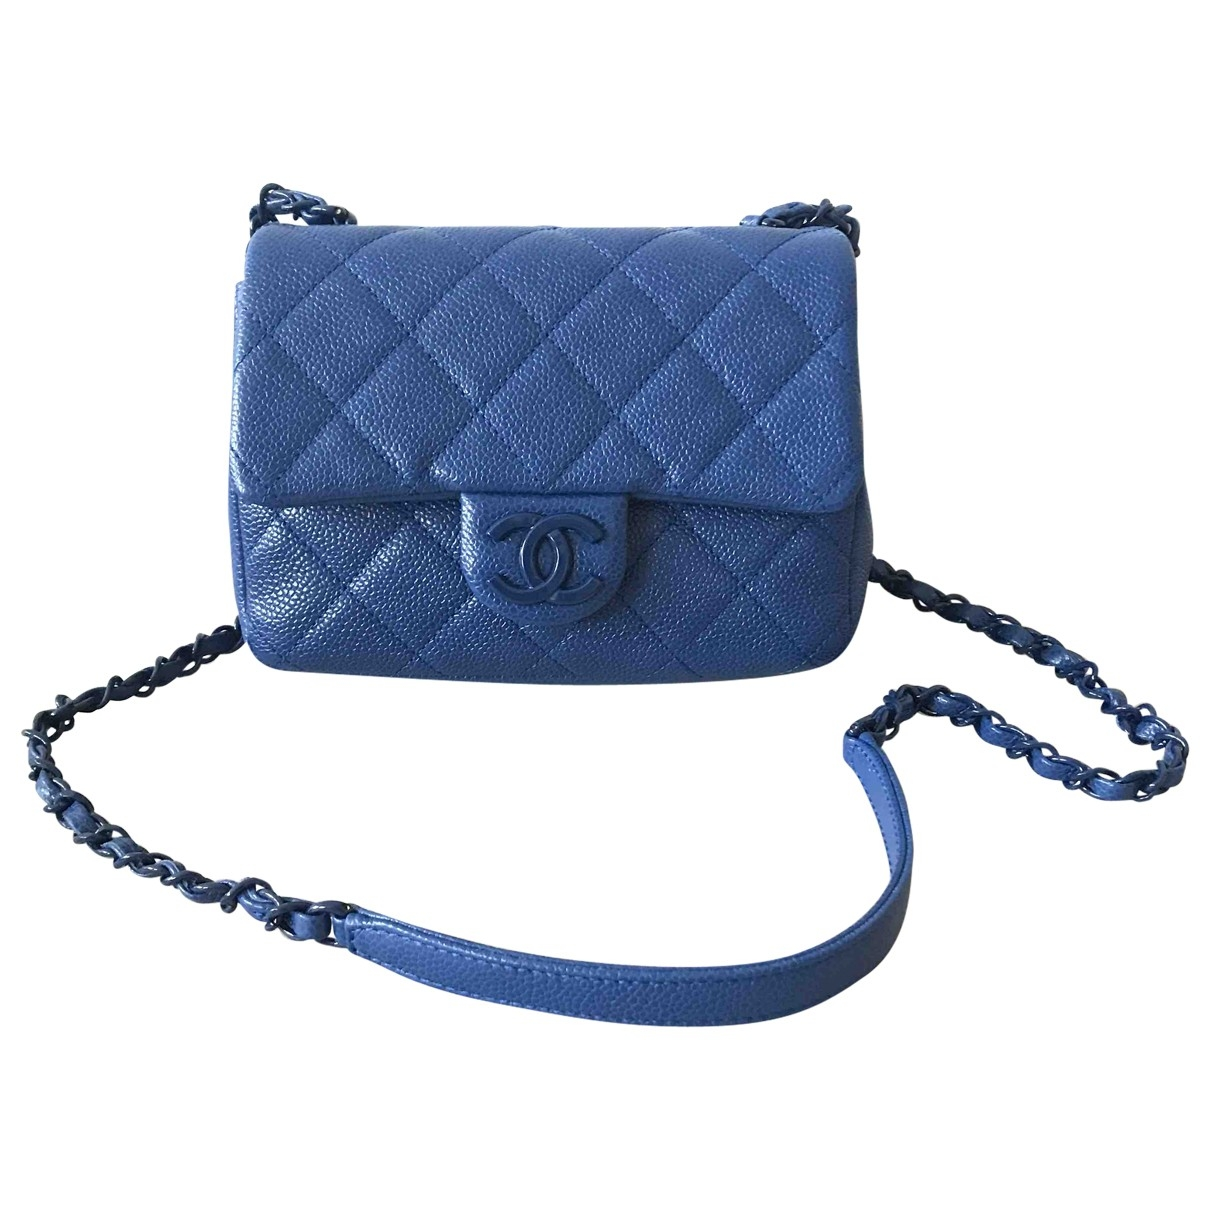 Chanel Timeless/Classique Handtasche in  Marine Leder